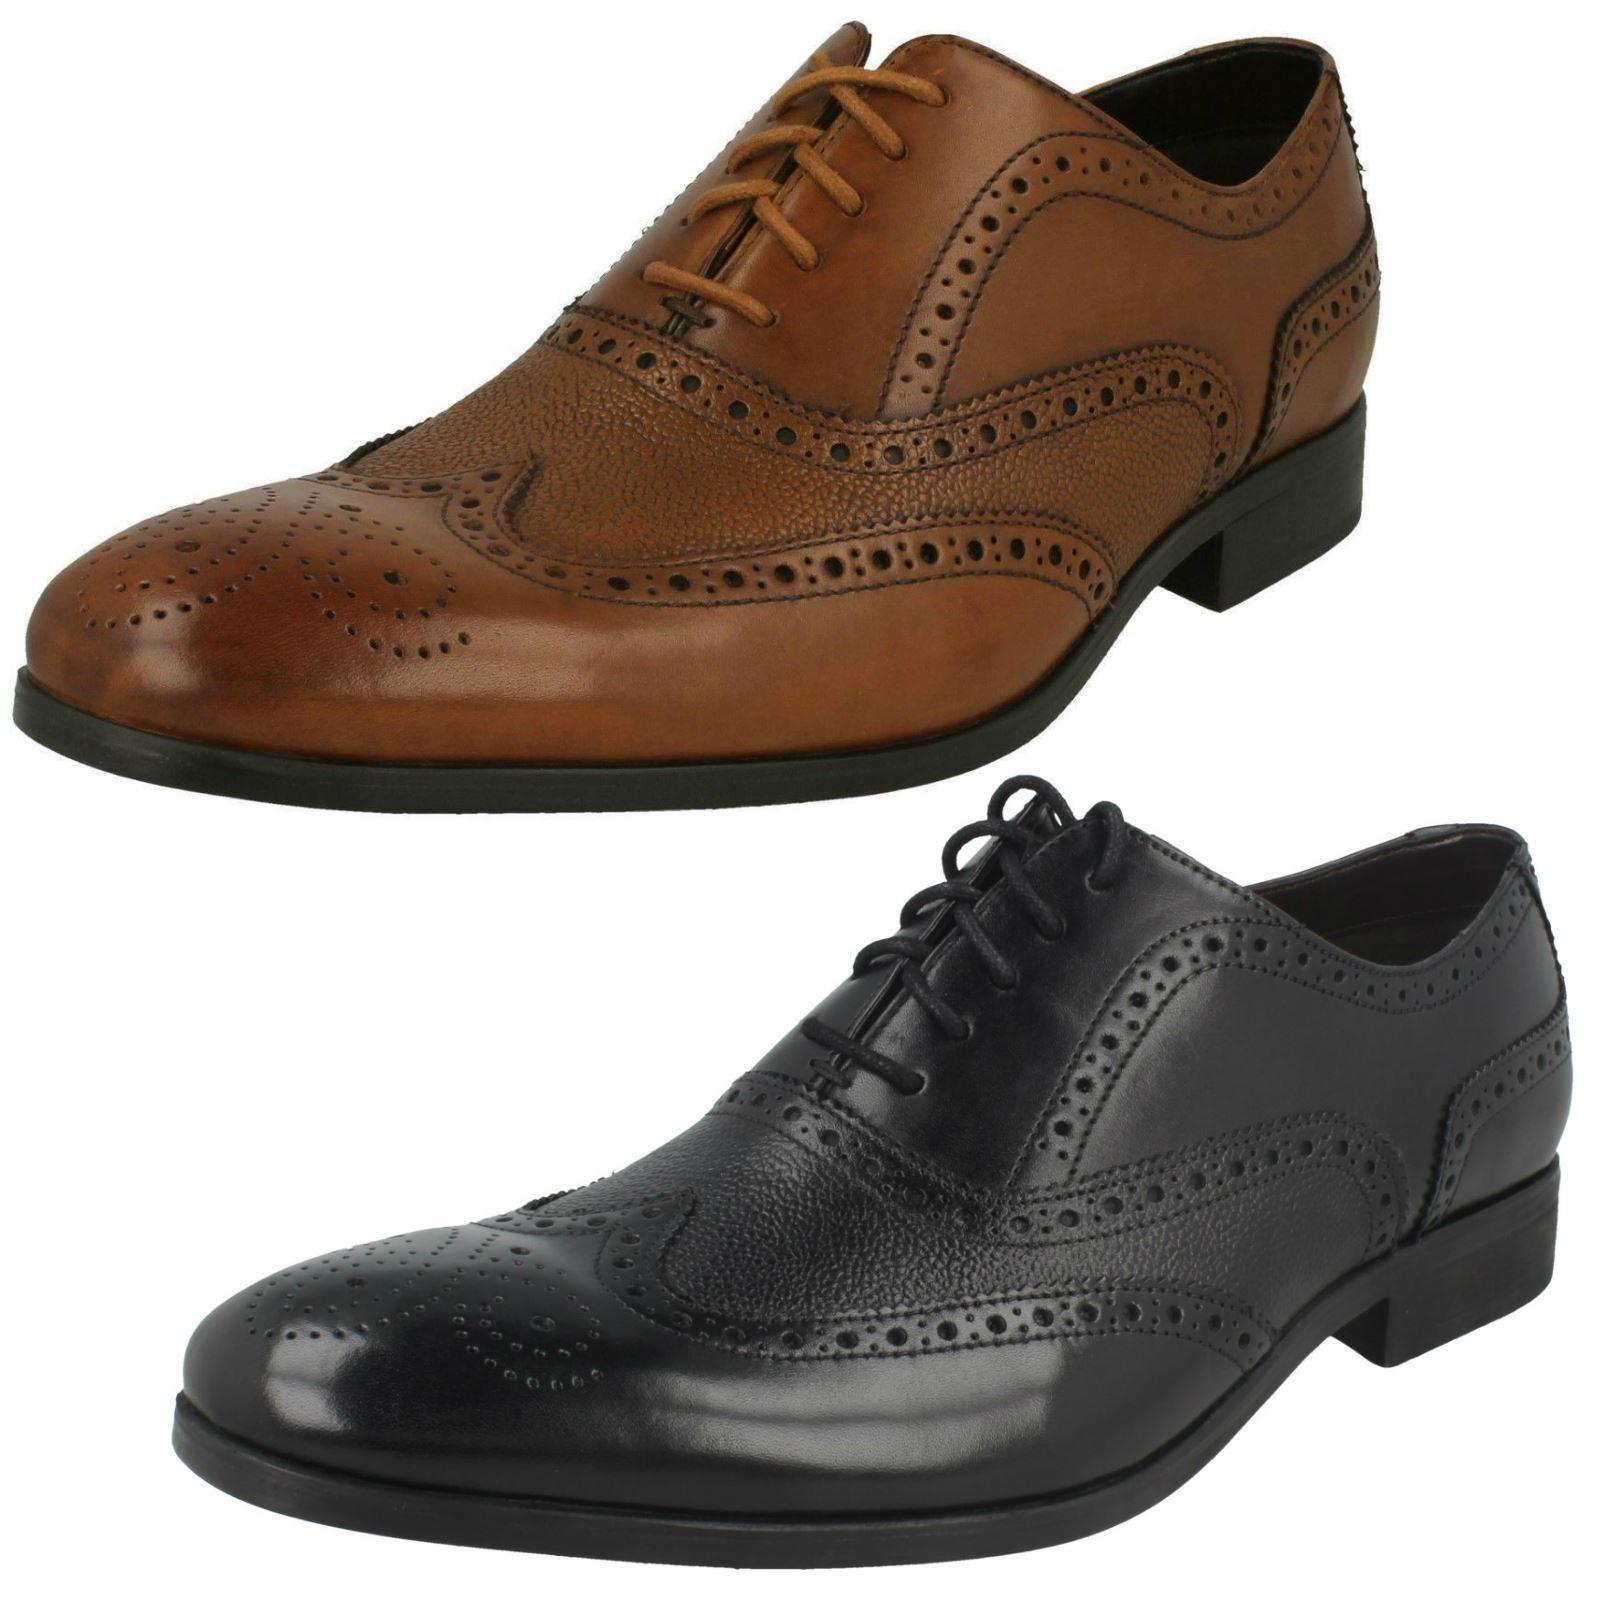 'Mens Clarks' Lace Up Brogue shoes - Gilmore Limit